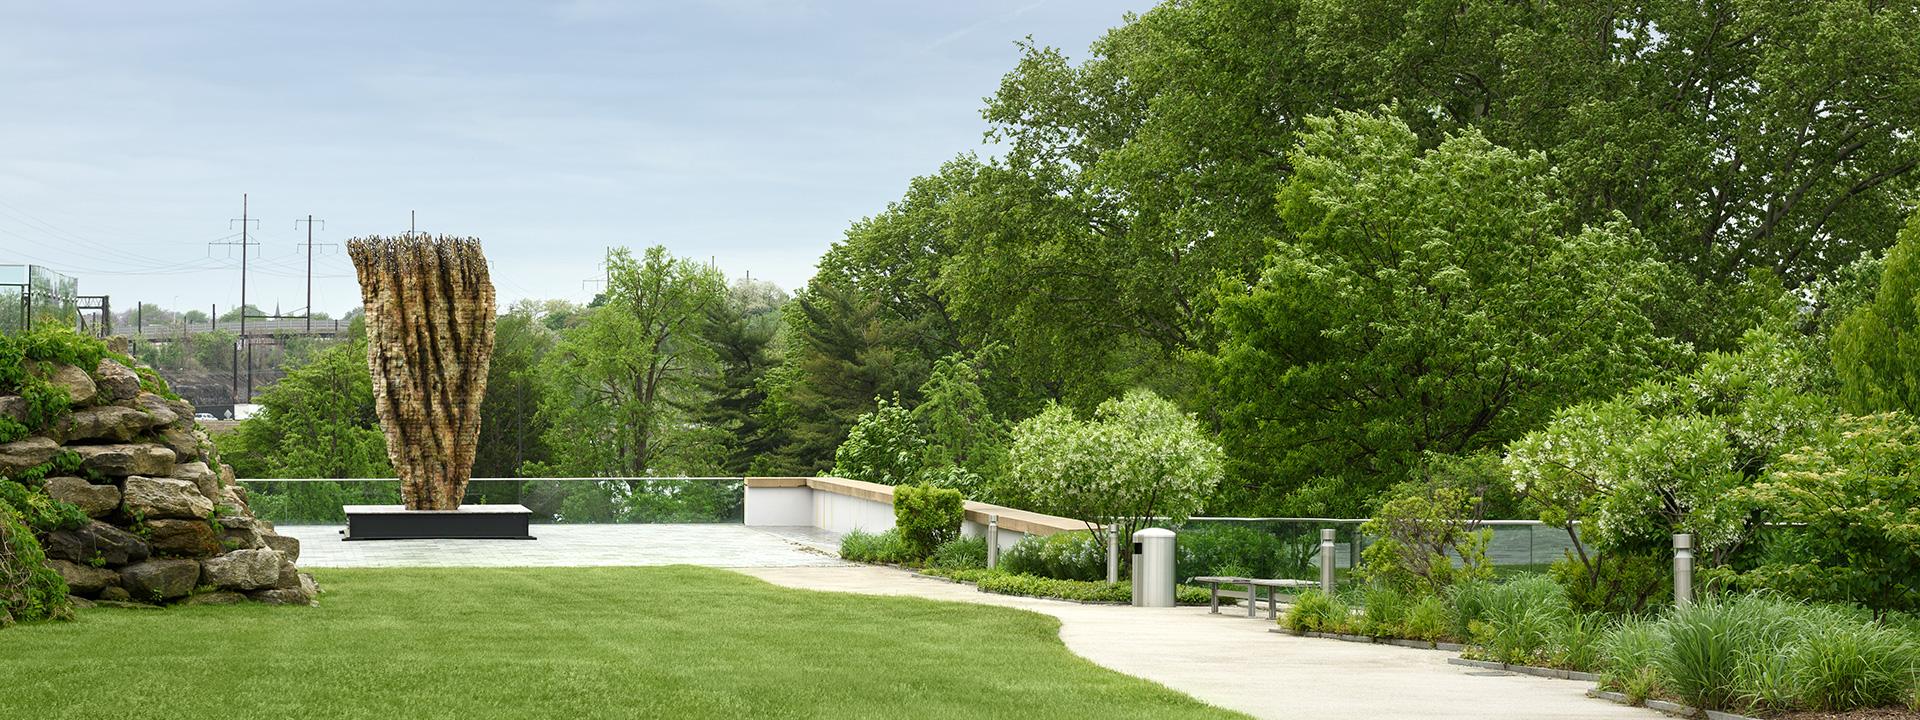 View of the Anne d'Harnoncourt Sculpture Garden